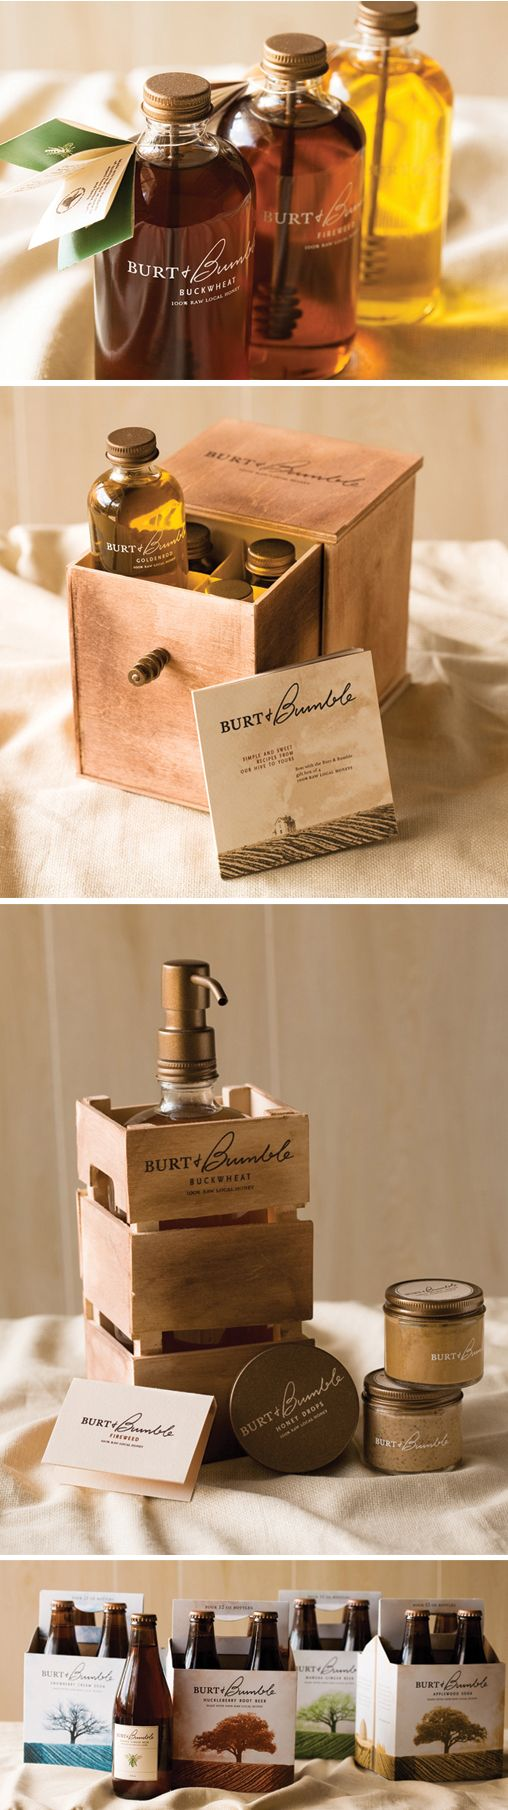 burt + bumble honey products design #packagedesign #design